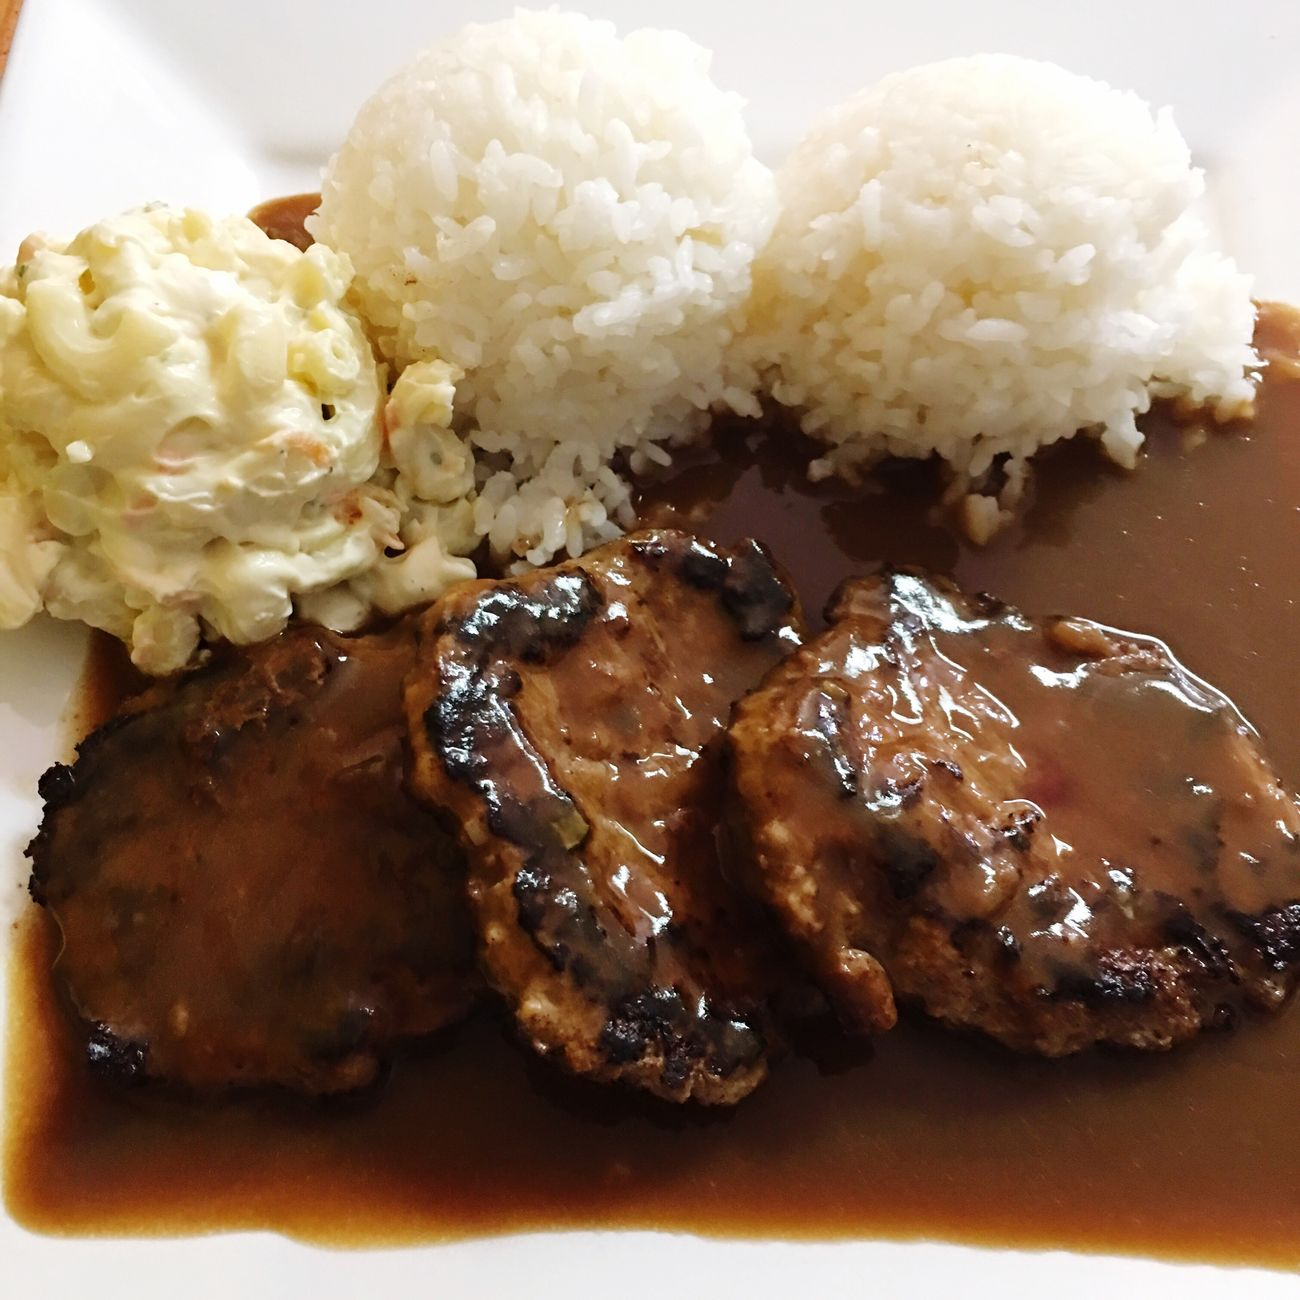 Bamboogrille Maui Wailuku Hamburger Steak